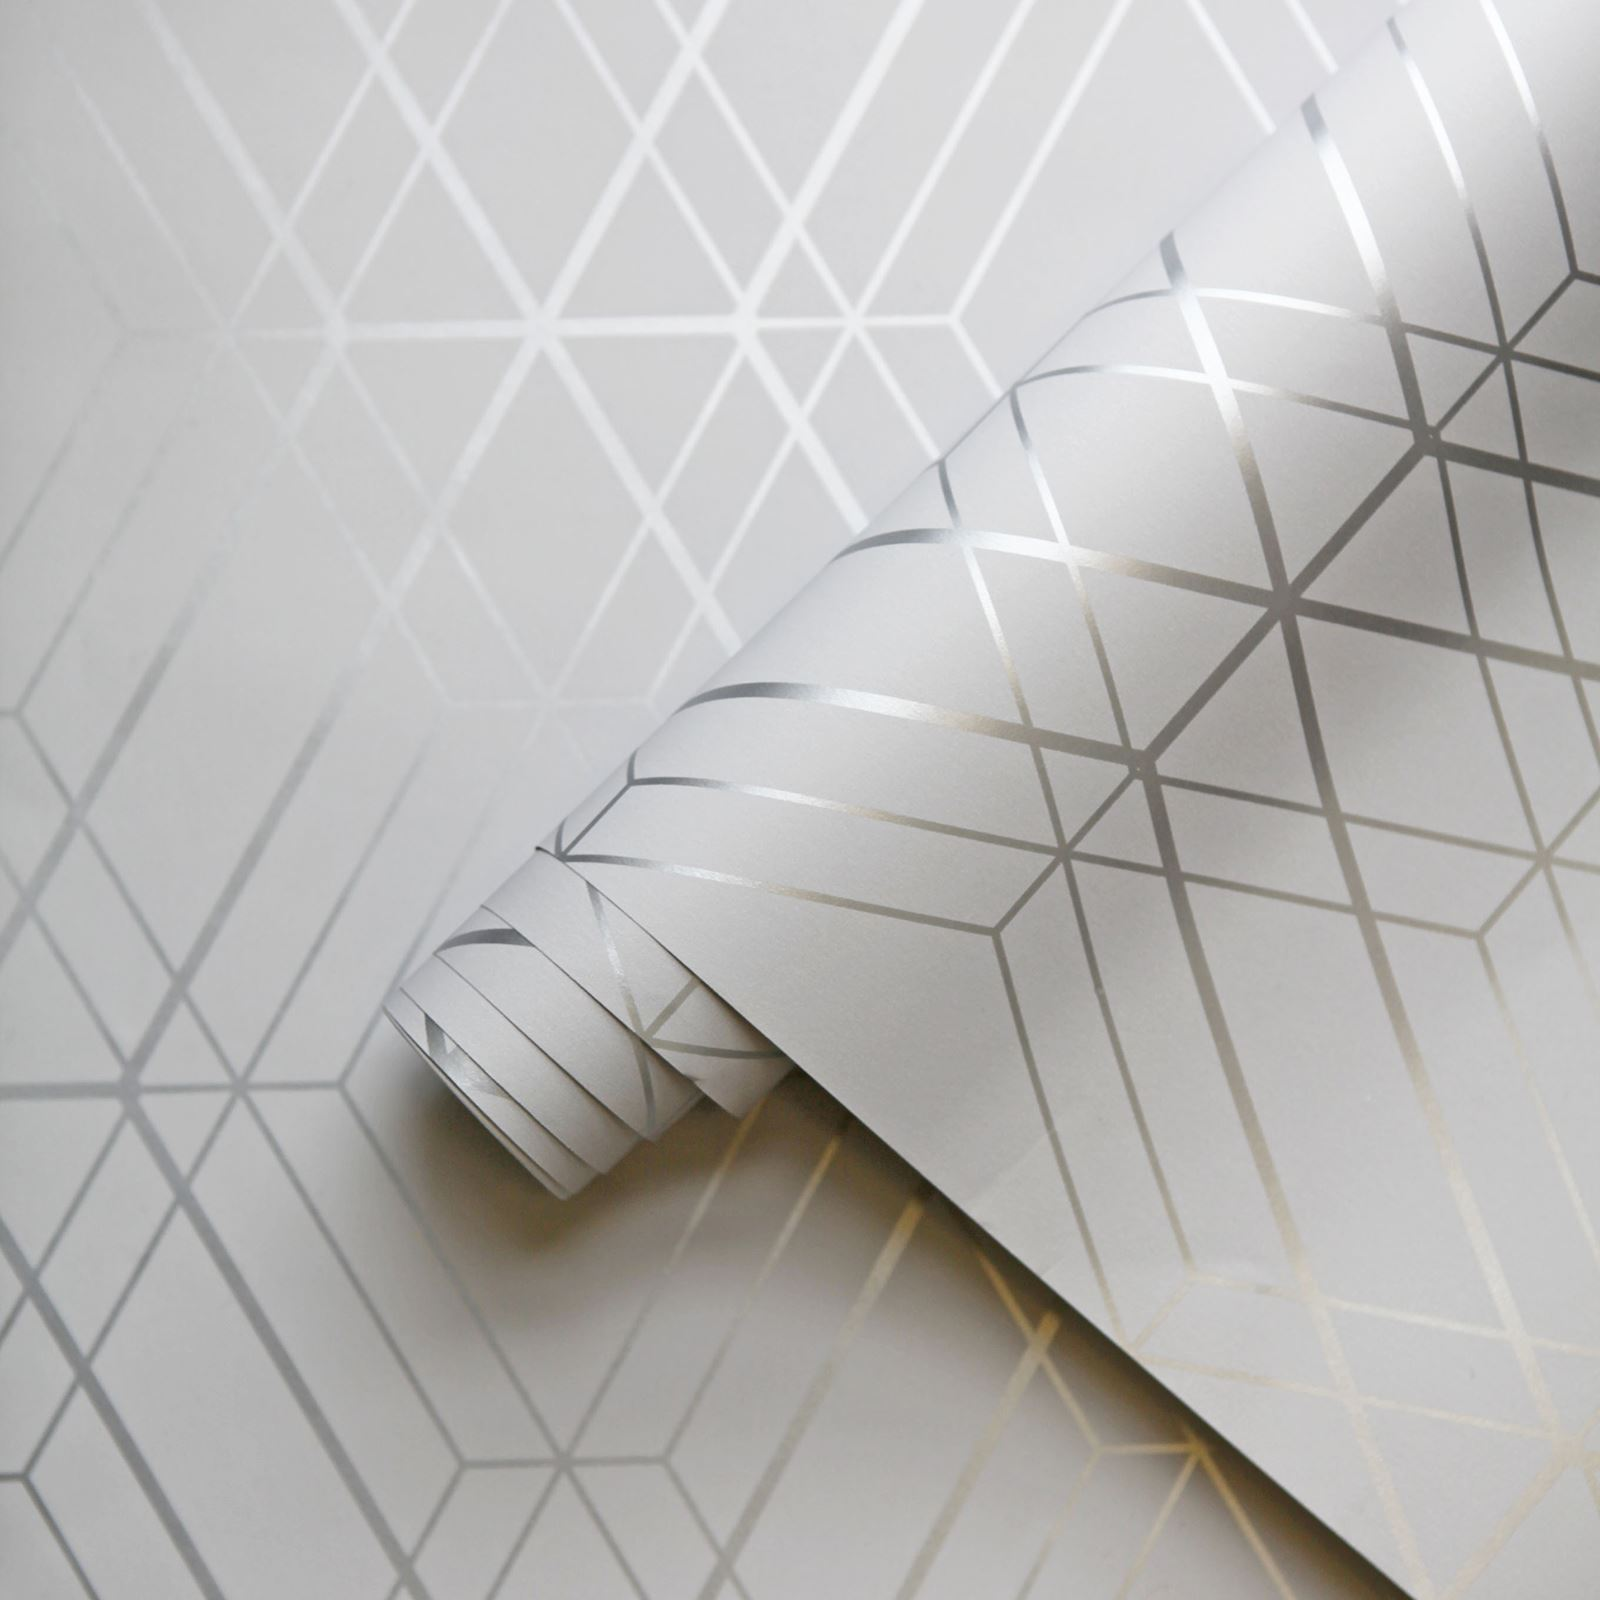 miniatura 33 - Carta da Parati Geometrica Arredamento Camera Moderno Vari Disegni e Colori